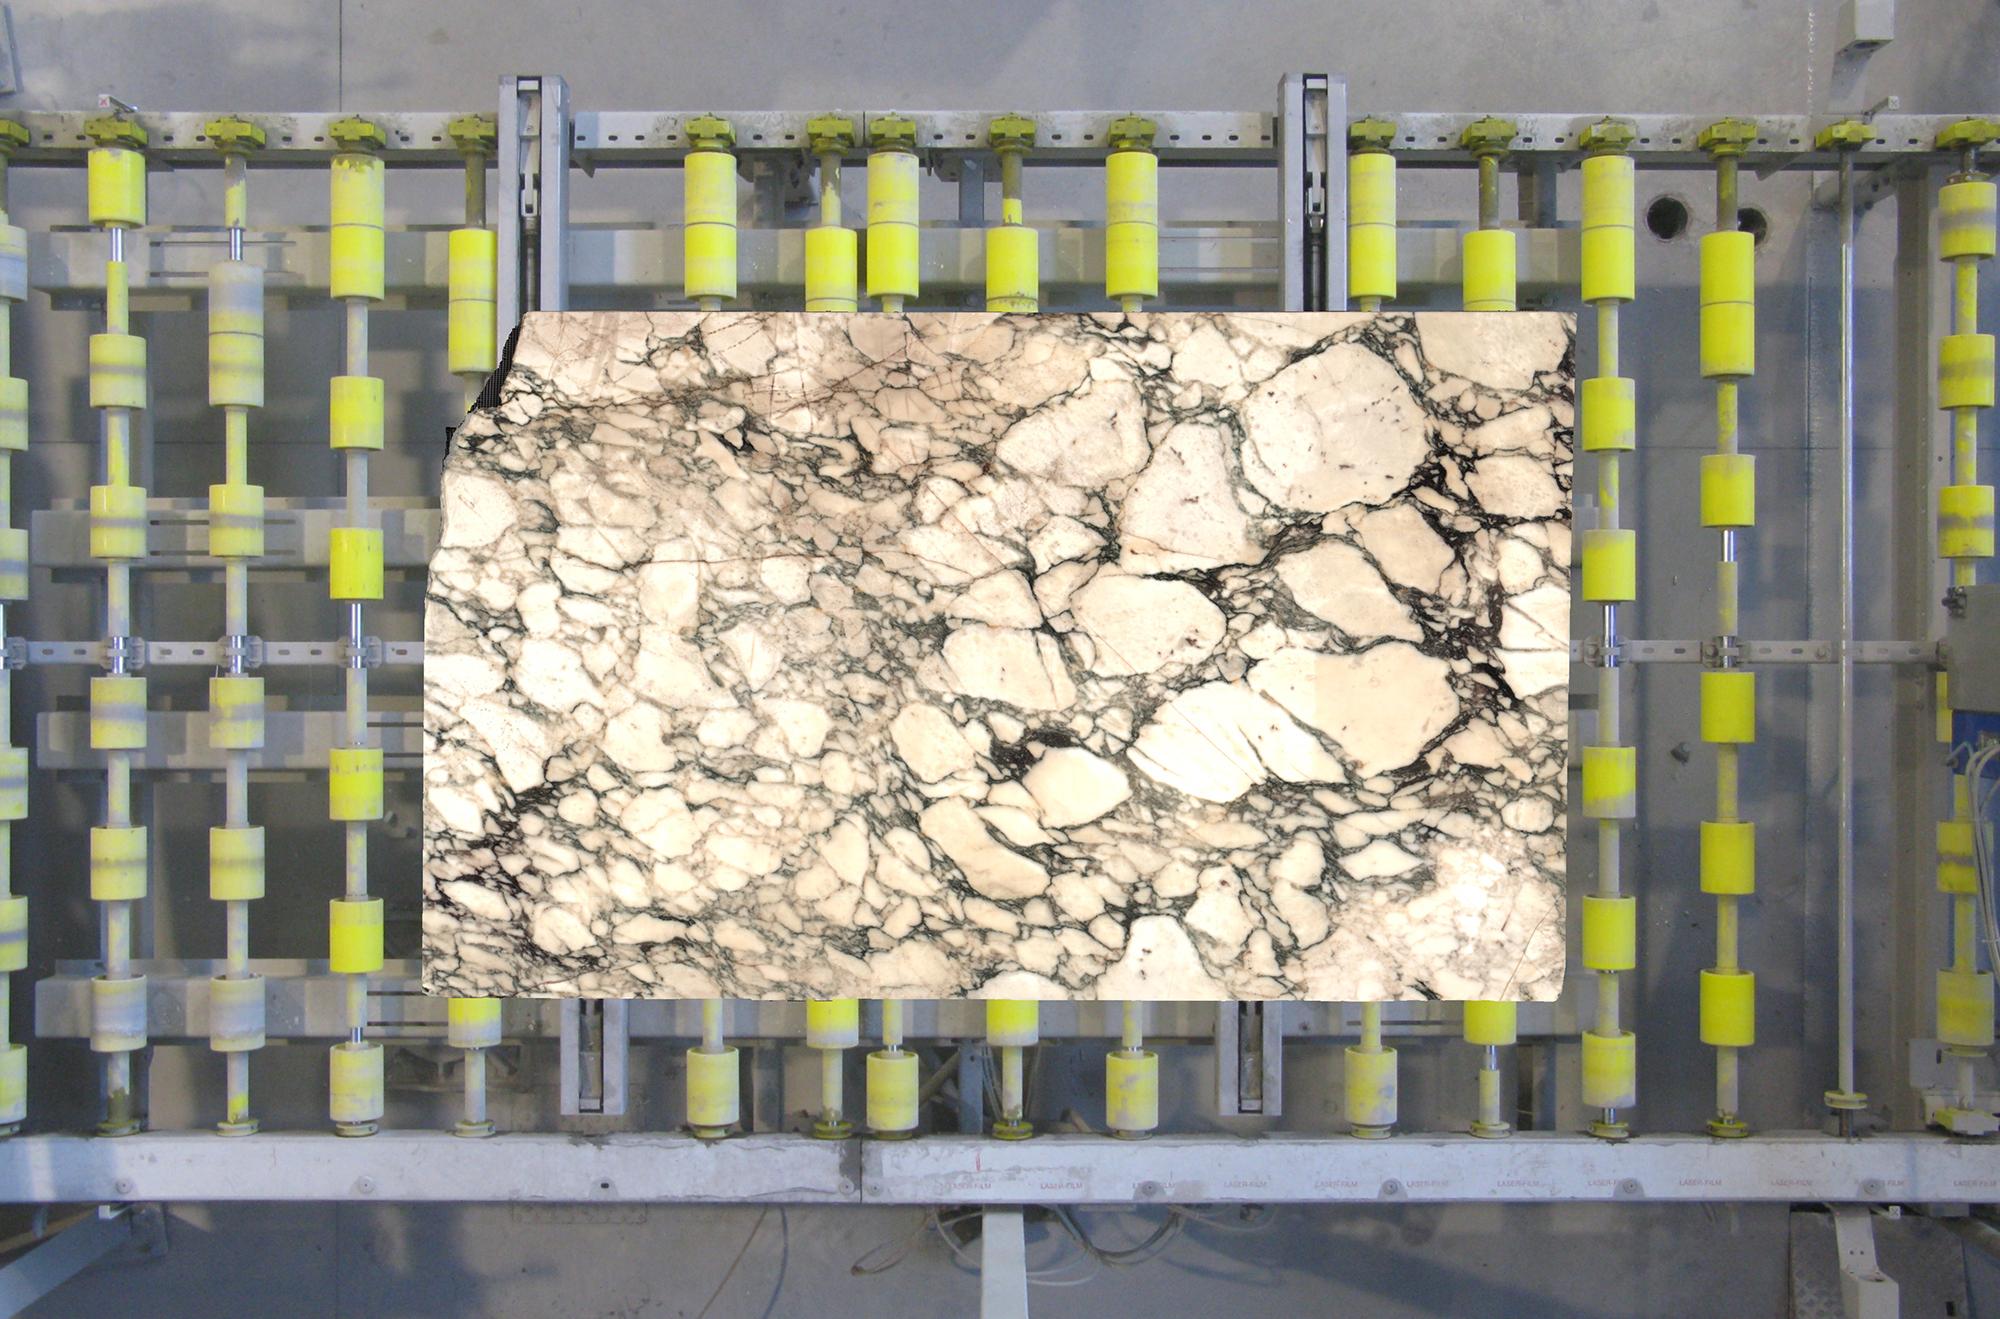 "Calacatta Fiorito Vagli - Sourced from our craftsmen quarries in Tuscany.It features ovulated veining in shades of grey, green, purple and brown on a white background. <ul>  <li>Ultimate tensile strength (UTS) to pressure stress: 1.137 Kg/Cm2</li>  <li>Ultimate tensile strength (UTS) after freezing cycles: <span class=""s2"">1.082</span>Kg/Cm2</li>  <li>Ultimate tensile strength (UTS) to bending stress: <span class=""s2"">86</span>Kg/Cm2</li>  <li>Thermic linear dilatation 10-6 per °C : <span class=""s2"">7,5</span></li>  <li>Water absorption coefficient % in WeighT: <span class=""s1"">0,20</span></li>  <li>Weight per unit volume:2.679 Kg/m3</li>  <li>Impact strength:36,3 Cm</li>  <li>Module of linear elasticity: 443.000 Kg/Cm2</li>  <li>Abrasion strength: 8,80 mm</li> </ul> | Matter of Stuff"